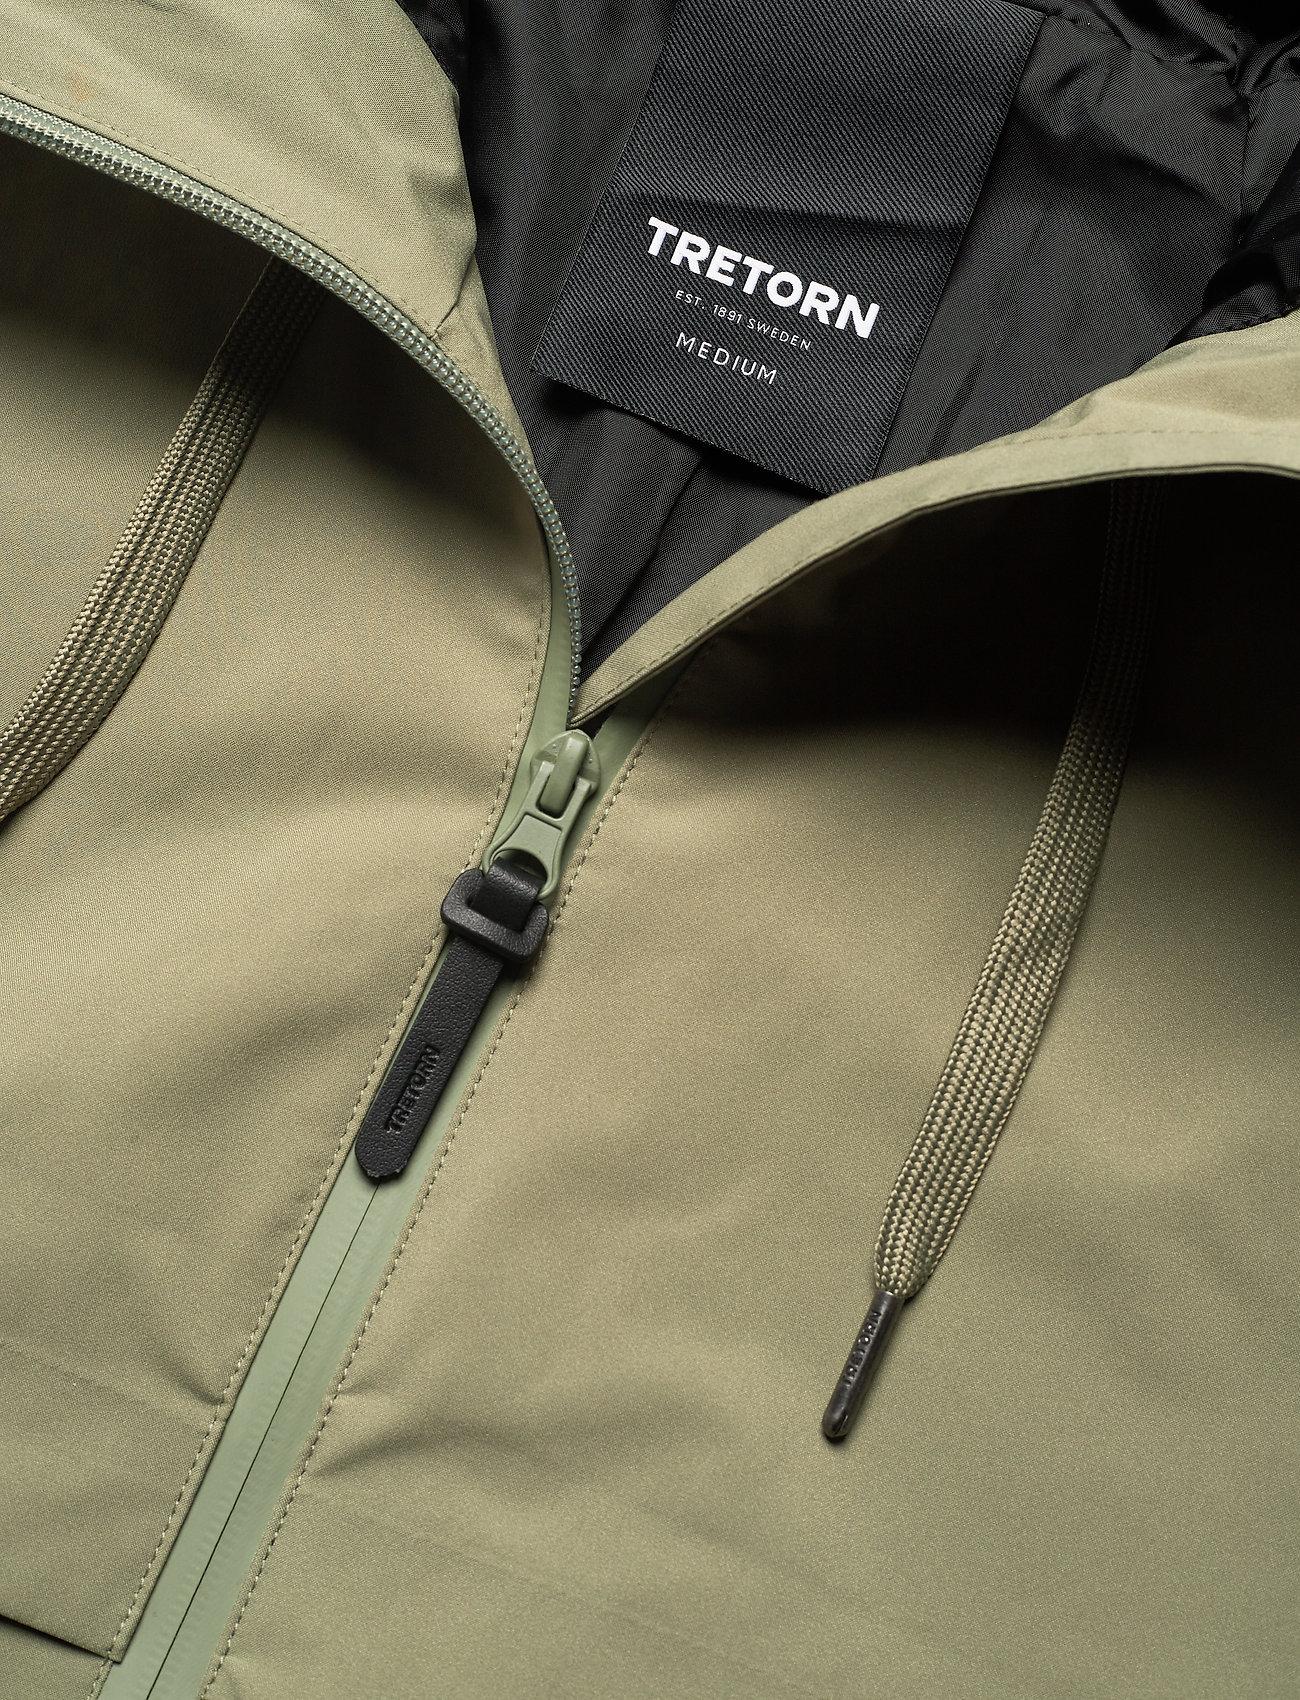 Tretorn - SPHERE LT M - parka's - 061/seagrass - 3